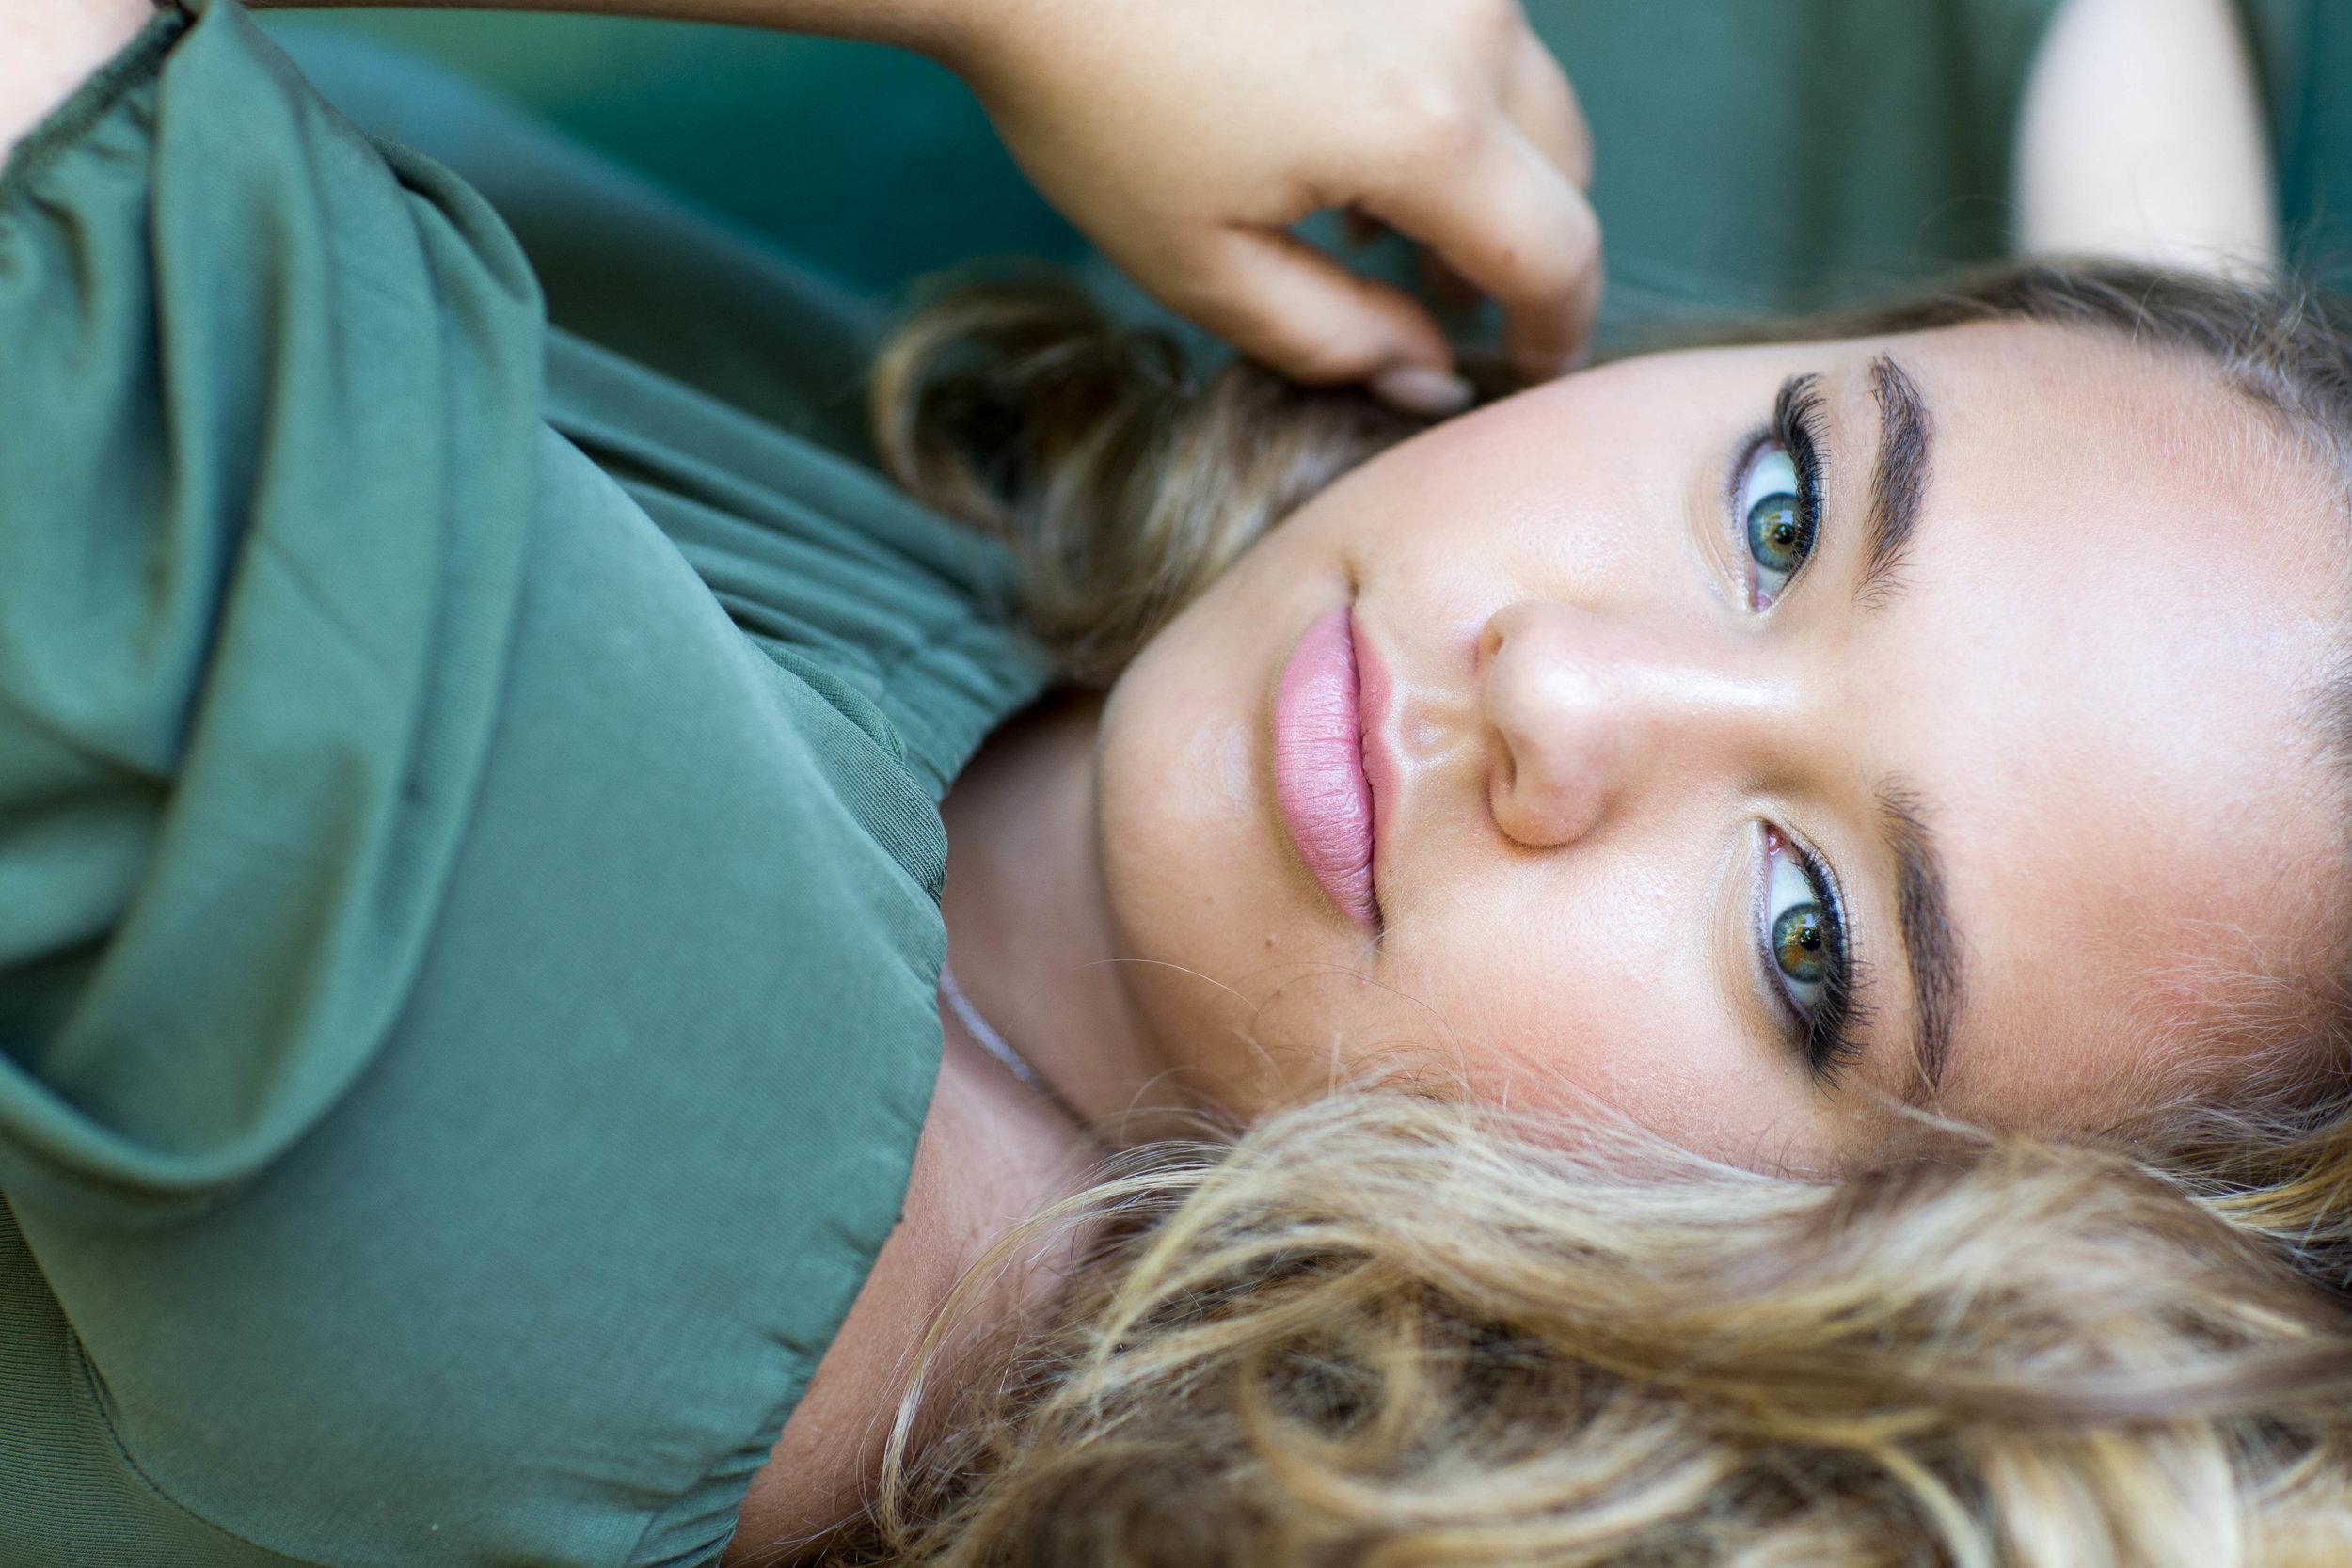 Portrait of green eyed girl